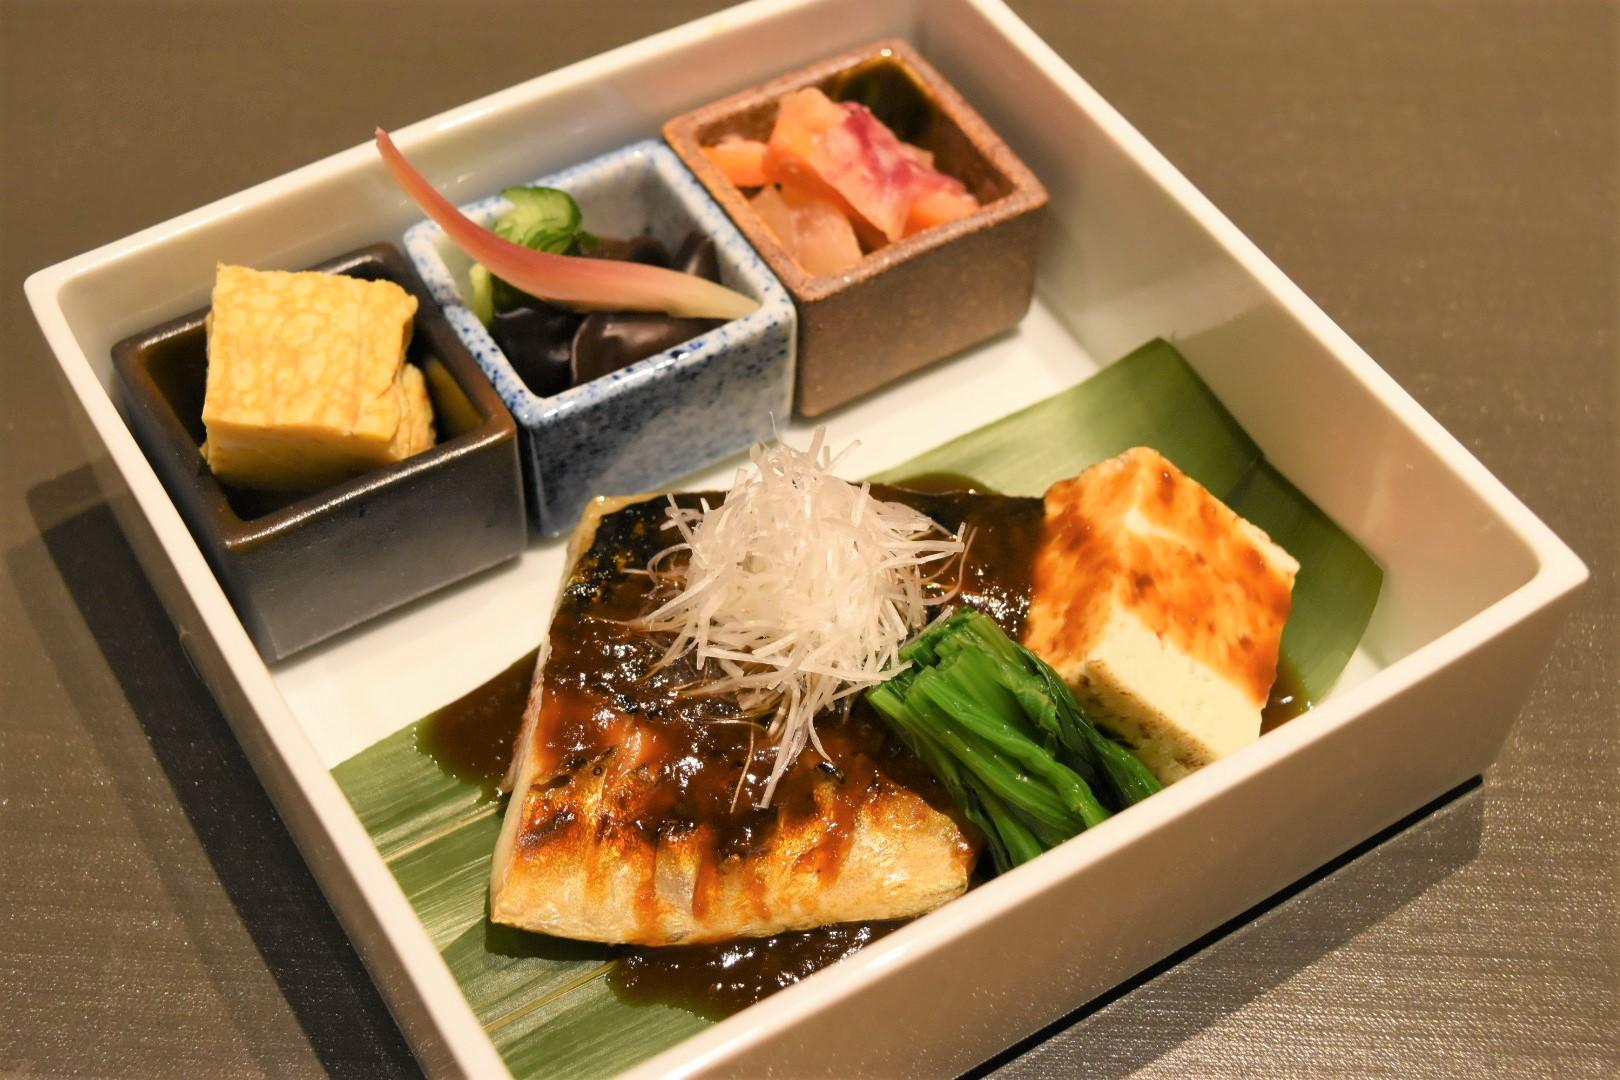 ginza-%e8%b1%89-kuki-ginza-japanese-restaurant-%e9%8a%80%e5%ba%a7%e6%97%a5%e6%9c%ac%e6%96%99%e7%90%863